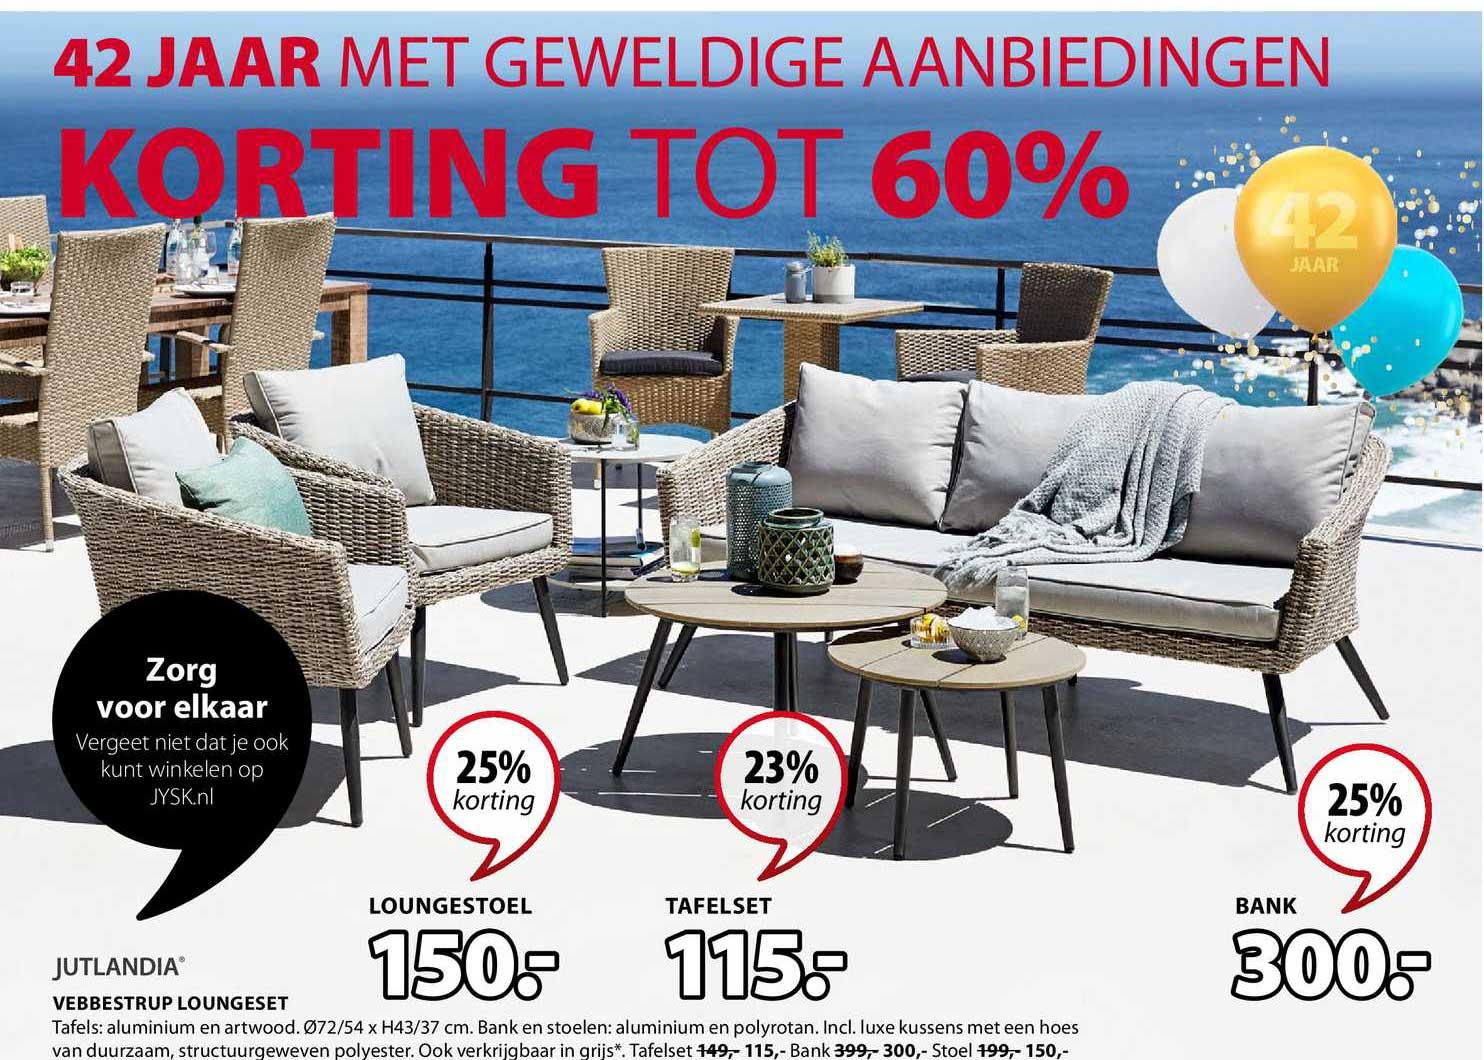 Jysk Jutlandia Vebbestrup Loungeset : Tafels, Bank En Stoelen 23% - 25% Korting